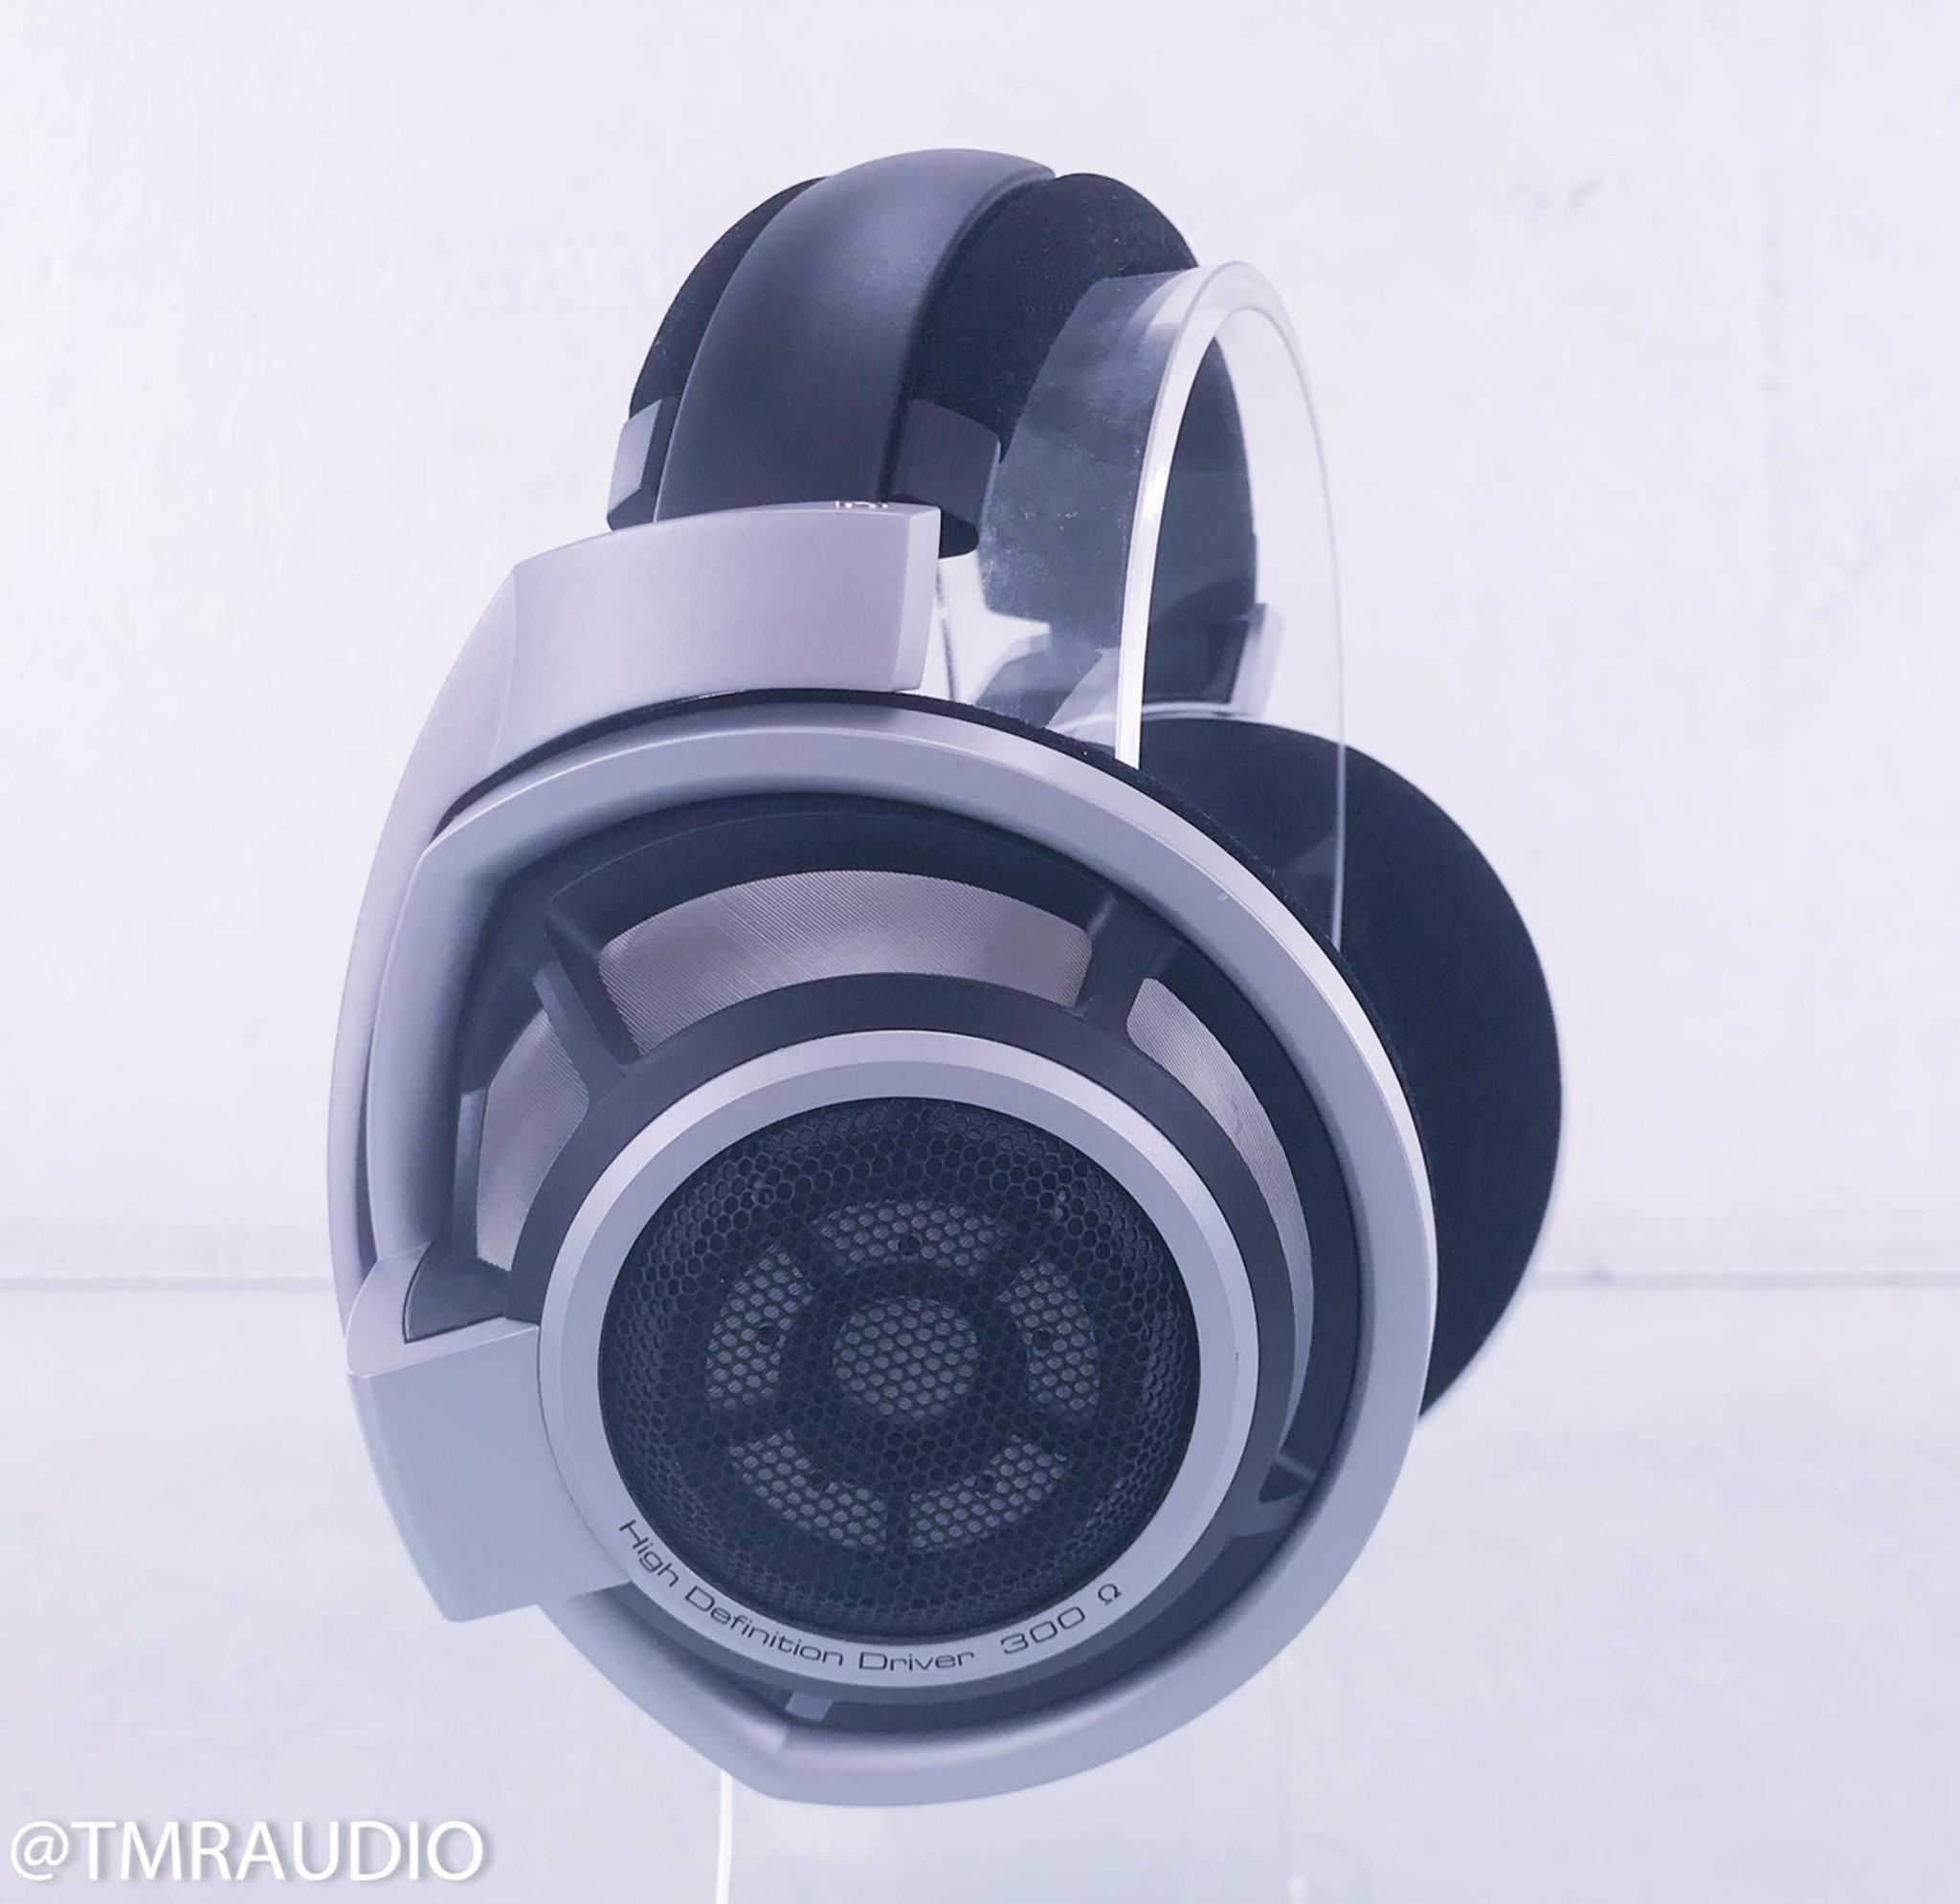 Sennheiser Hd800 Headphones The Best Headphone 2018 Hd 800 Dynamic Stereo Professional